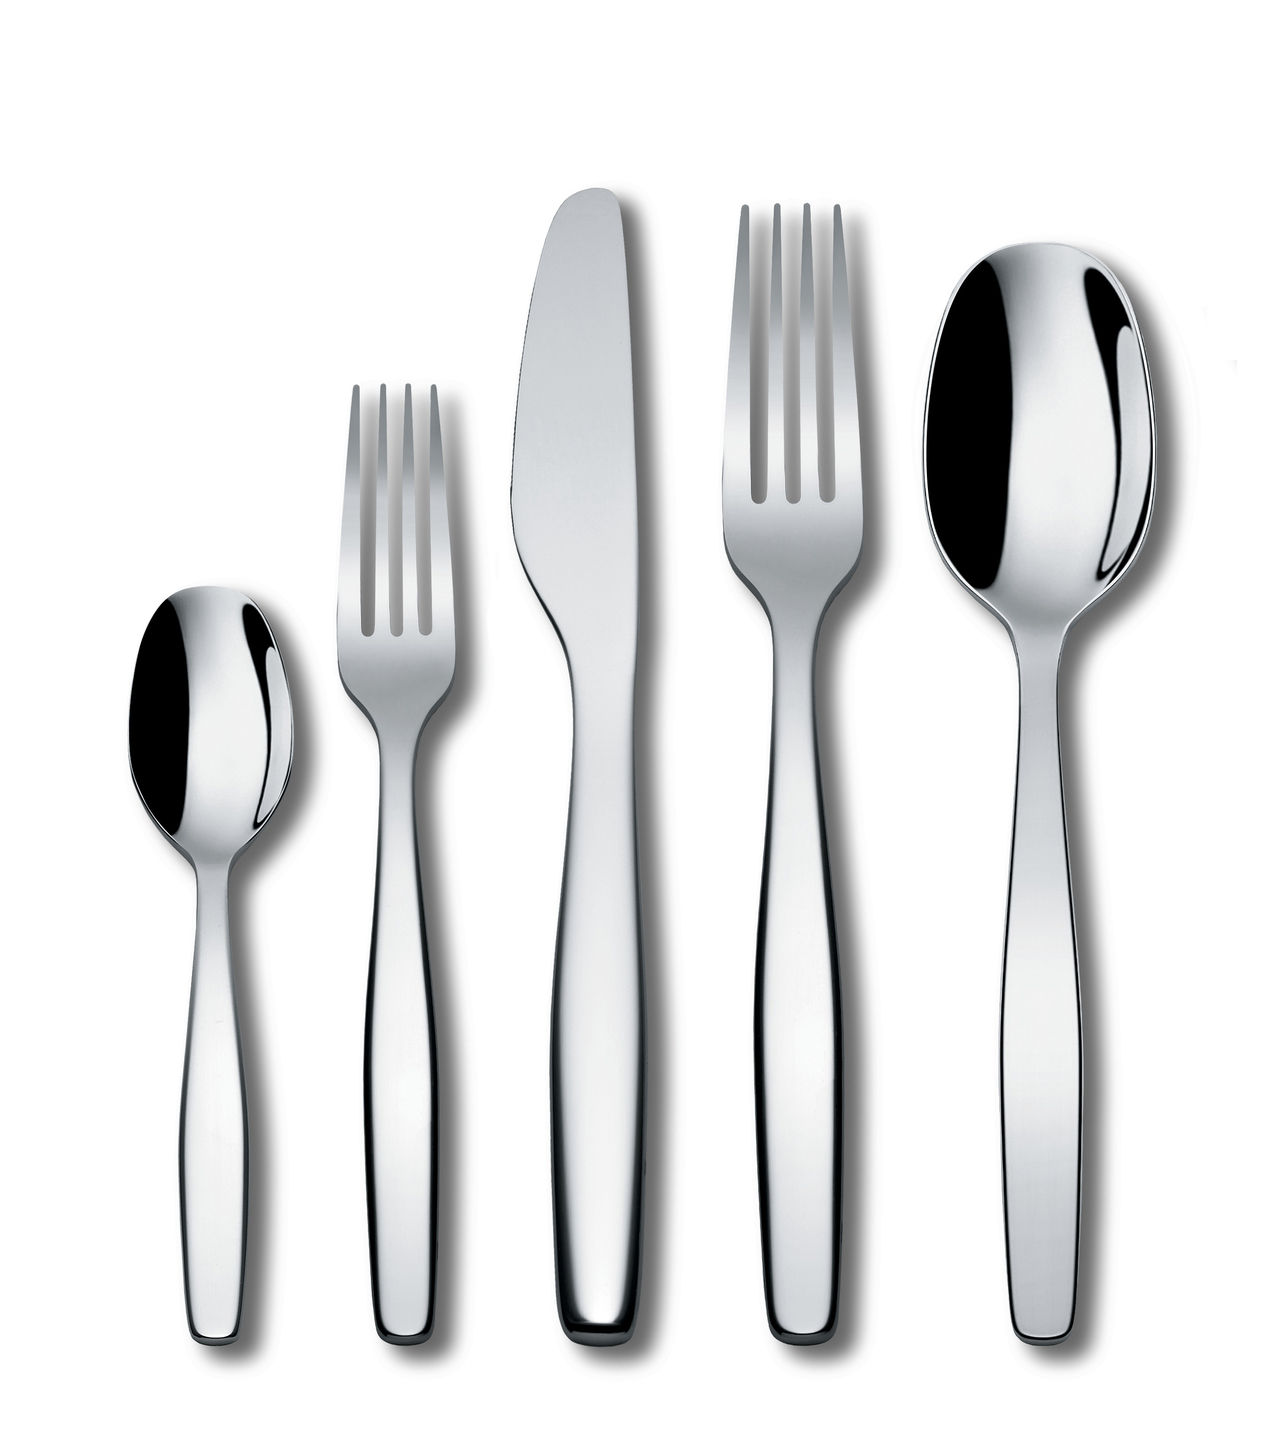 Tischkultur - Bestecke - Itsumo Besteck Set / 5 Teile - 1 Person - A di Alessi - Stahl - rostfreier Stahl